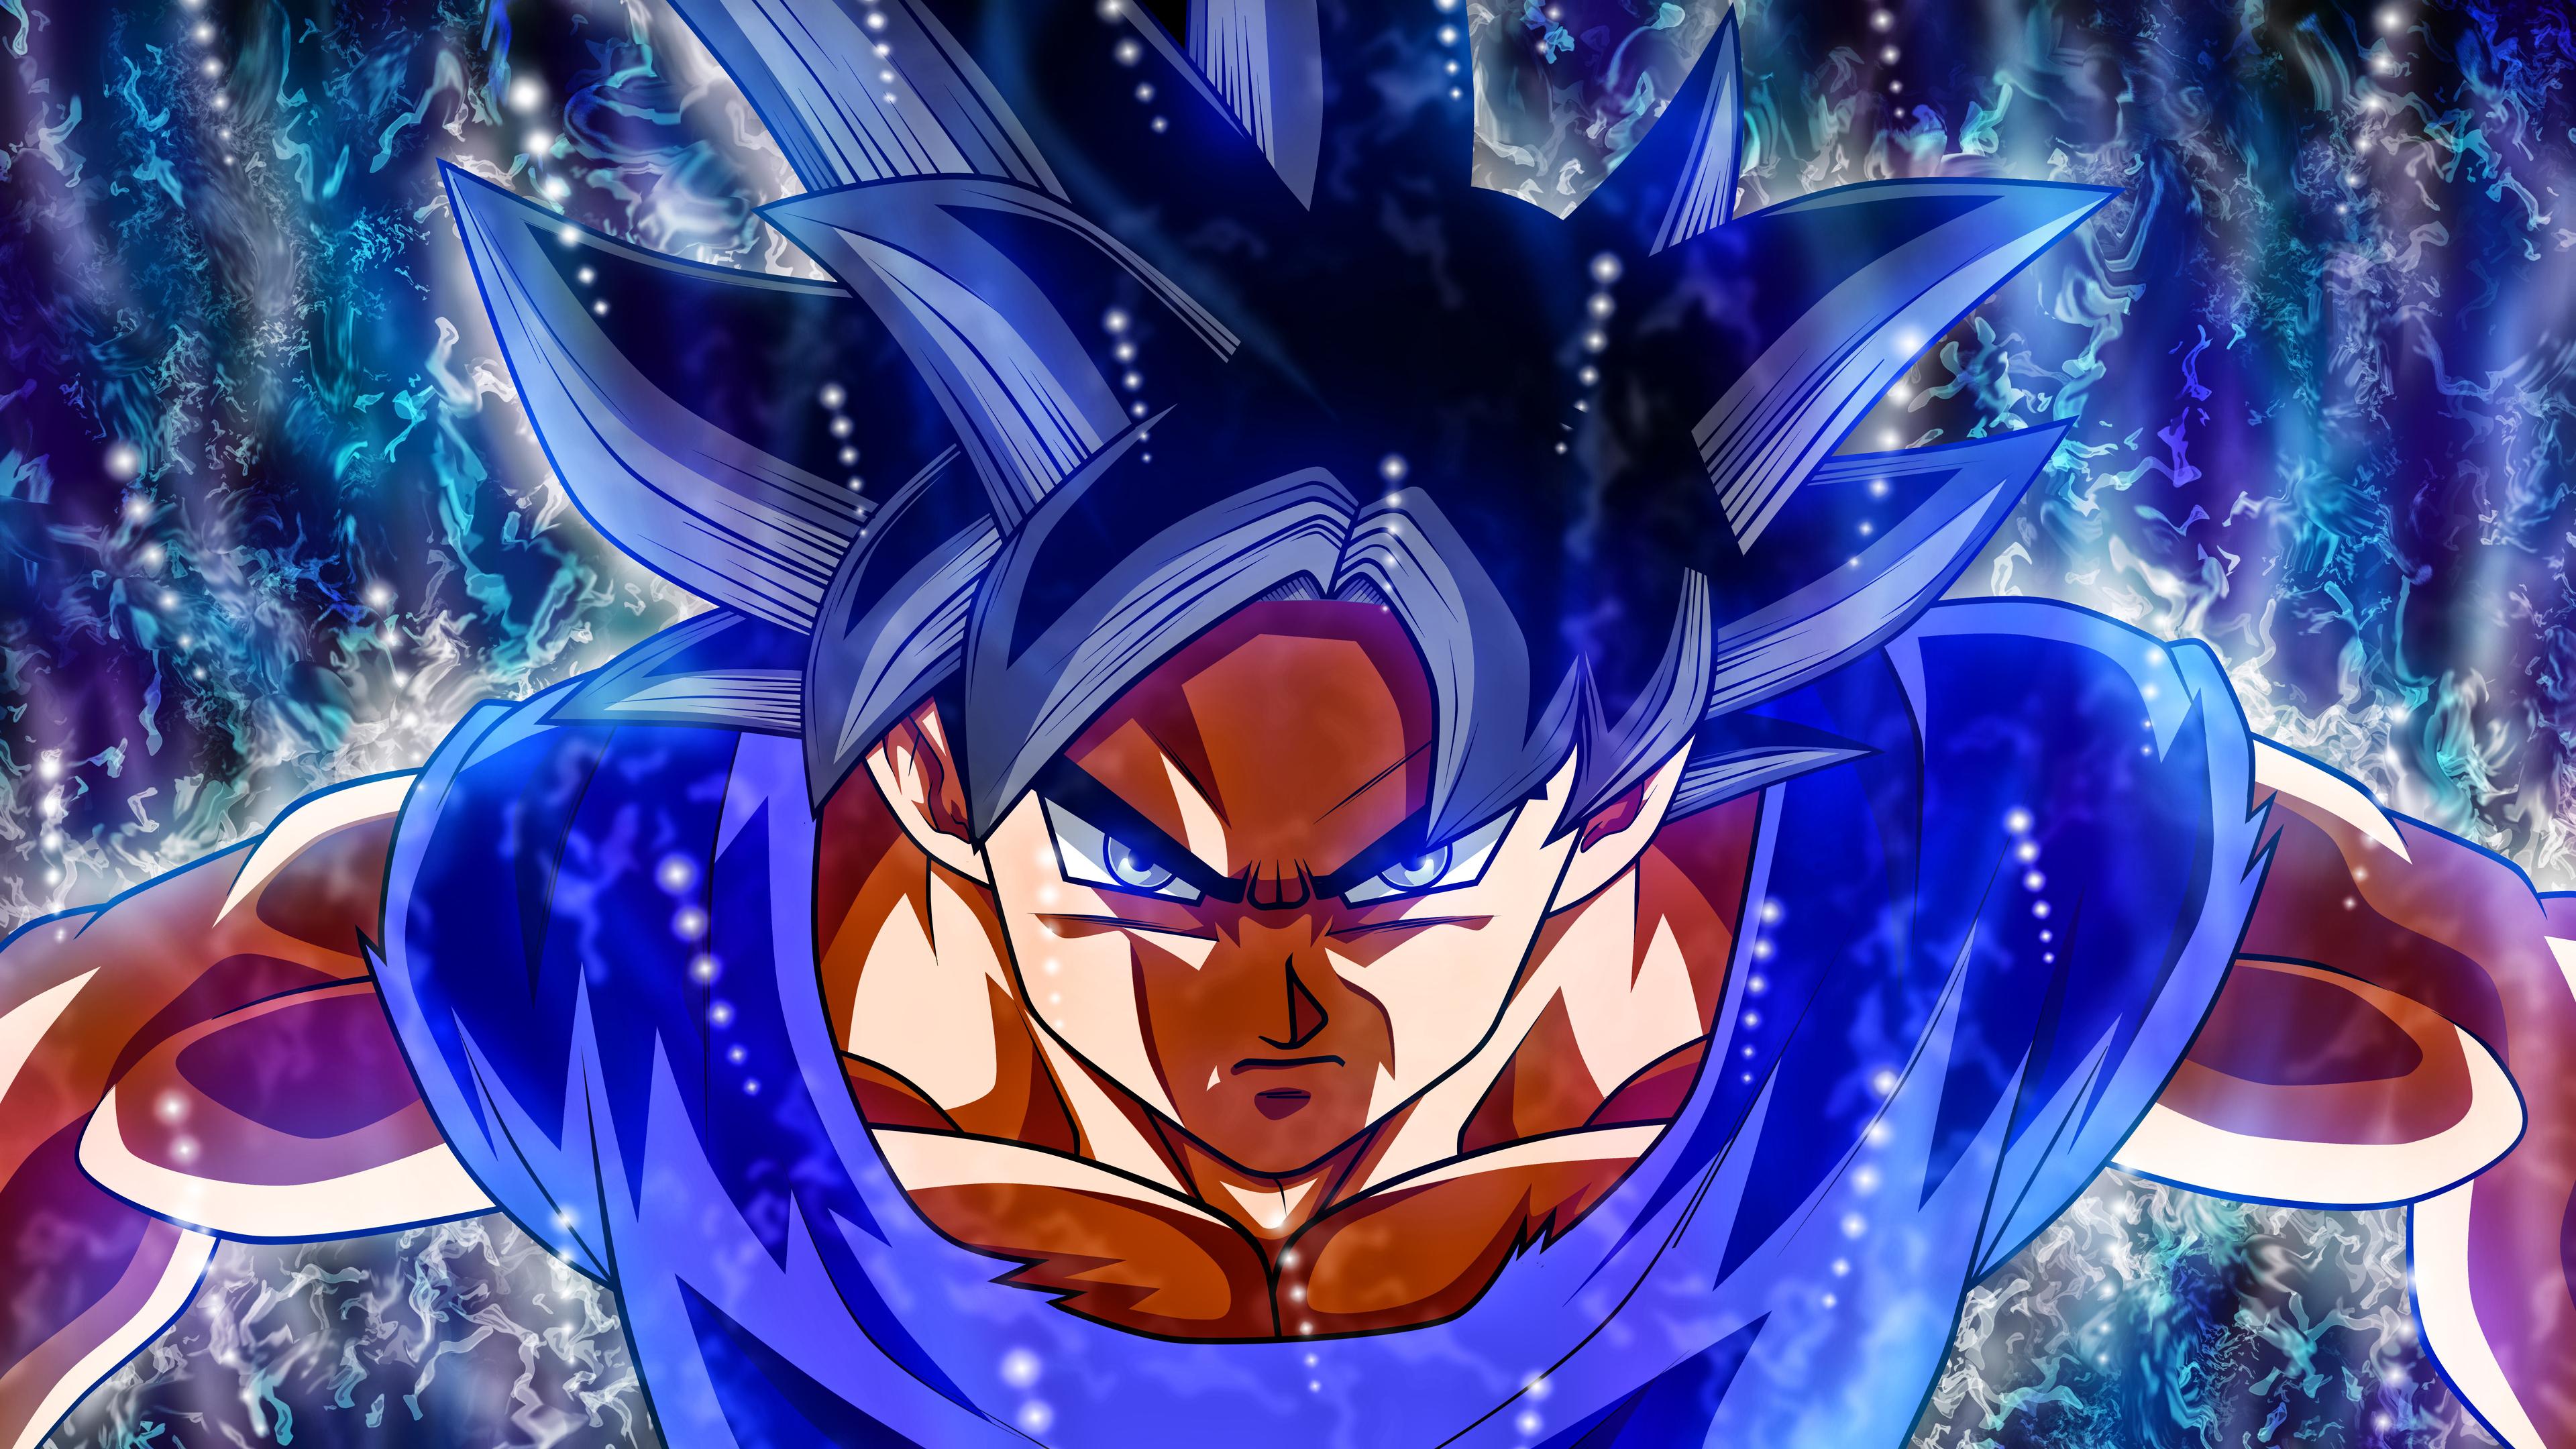 3840x2160 Goku Ultra Instinct Refresh 8k 4k HD 4k ...